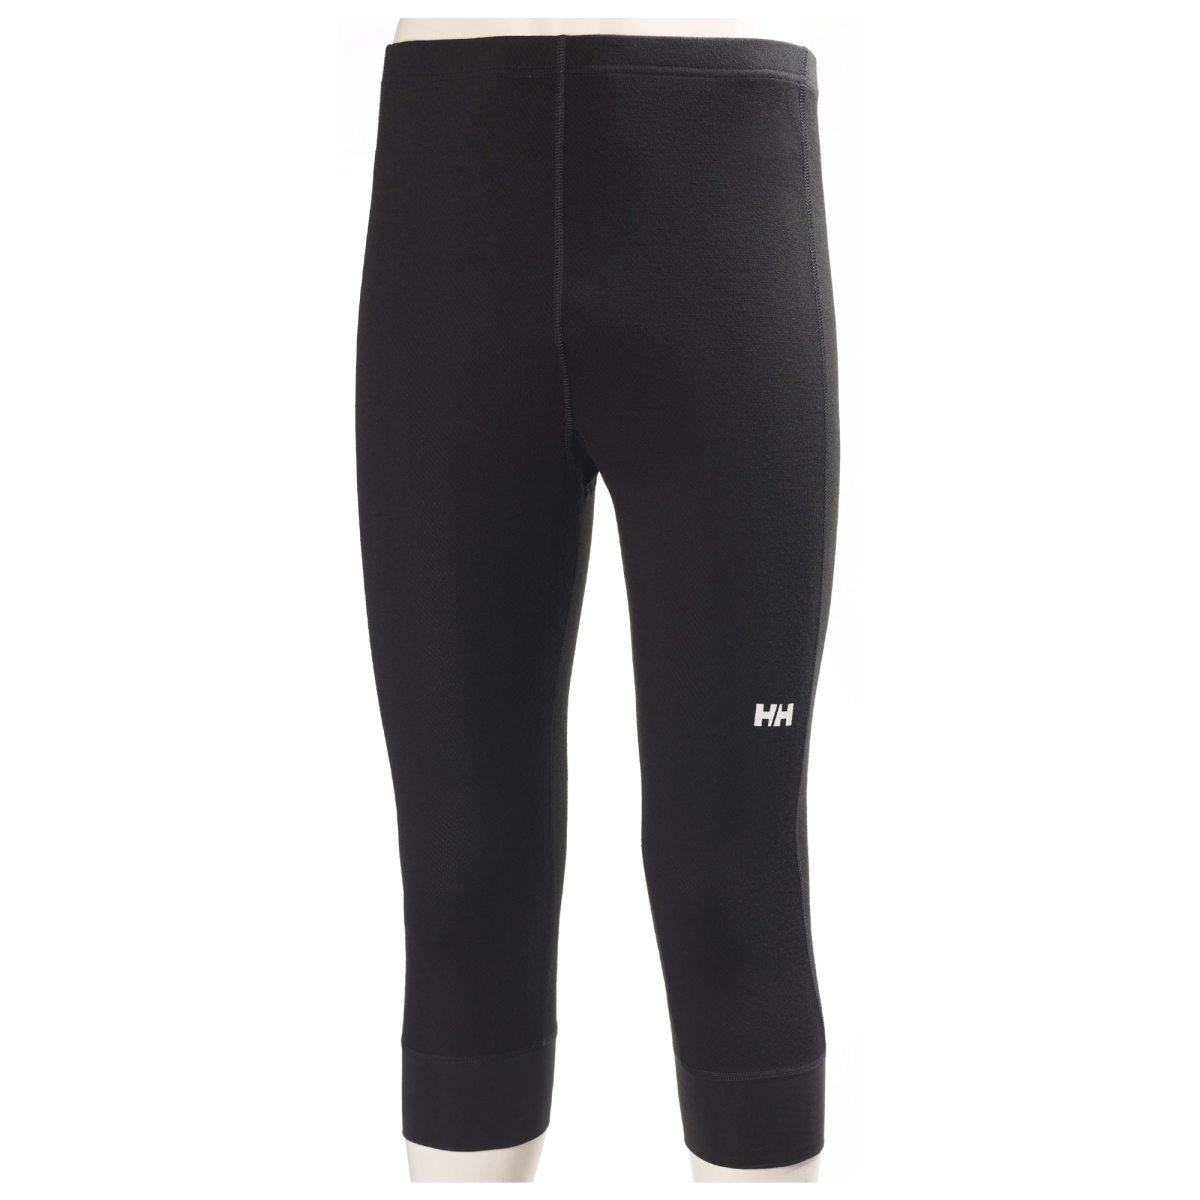 ea405ec0 core pants herre available via PricePi.com. Shop the entire internet ...